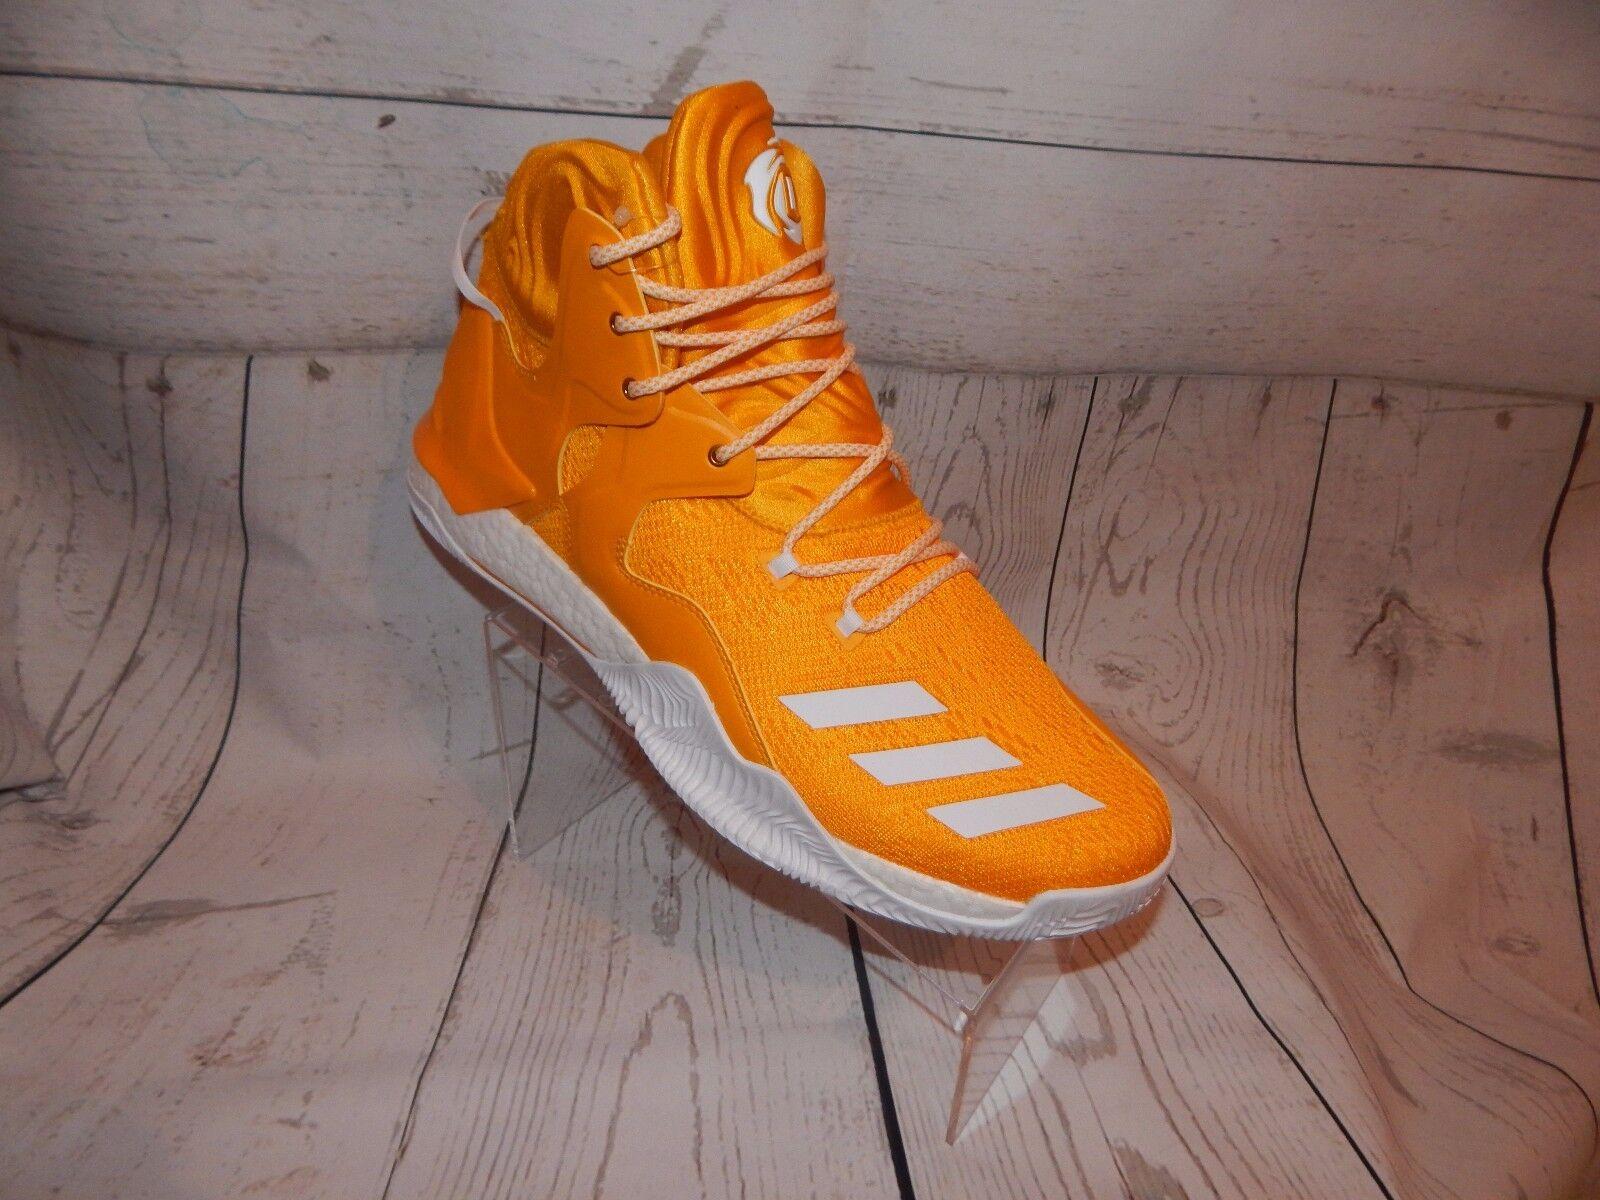 ADIDAS D pink 7 BOOST NCAA YELLOW gold B38939 - Basketball  Men's shoes SZ 13.5